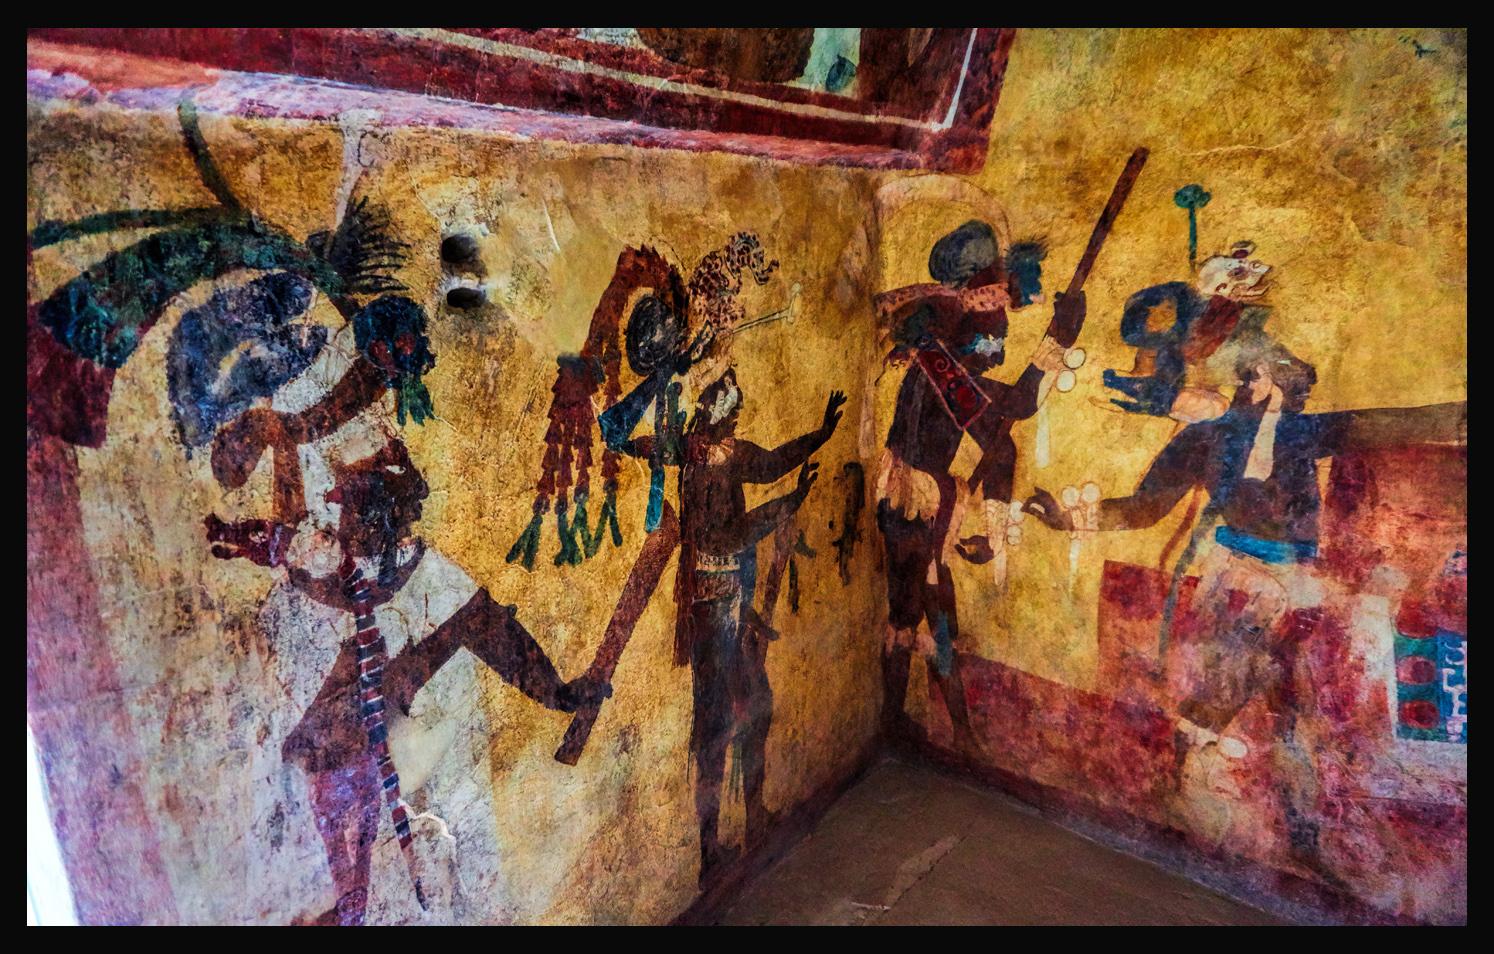 Mayan Murals of Bon&ak & The Amazing Mayan Murals of Bonampak - rcquinn.com